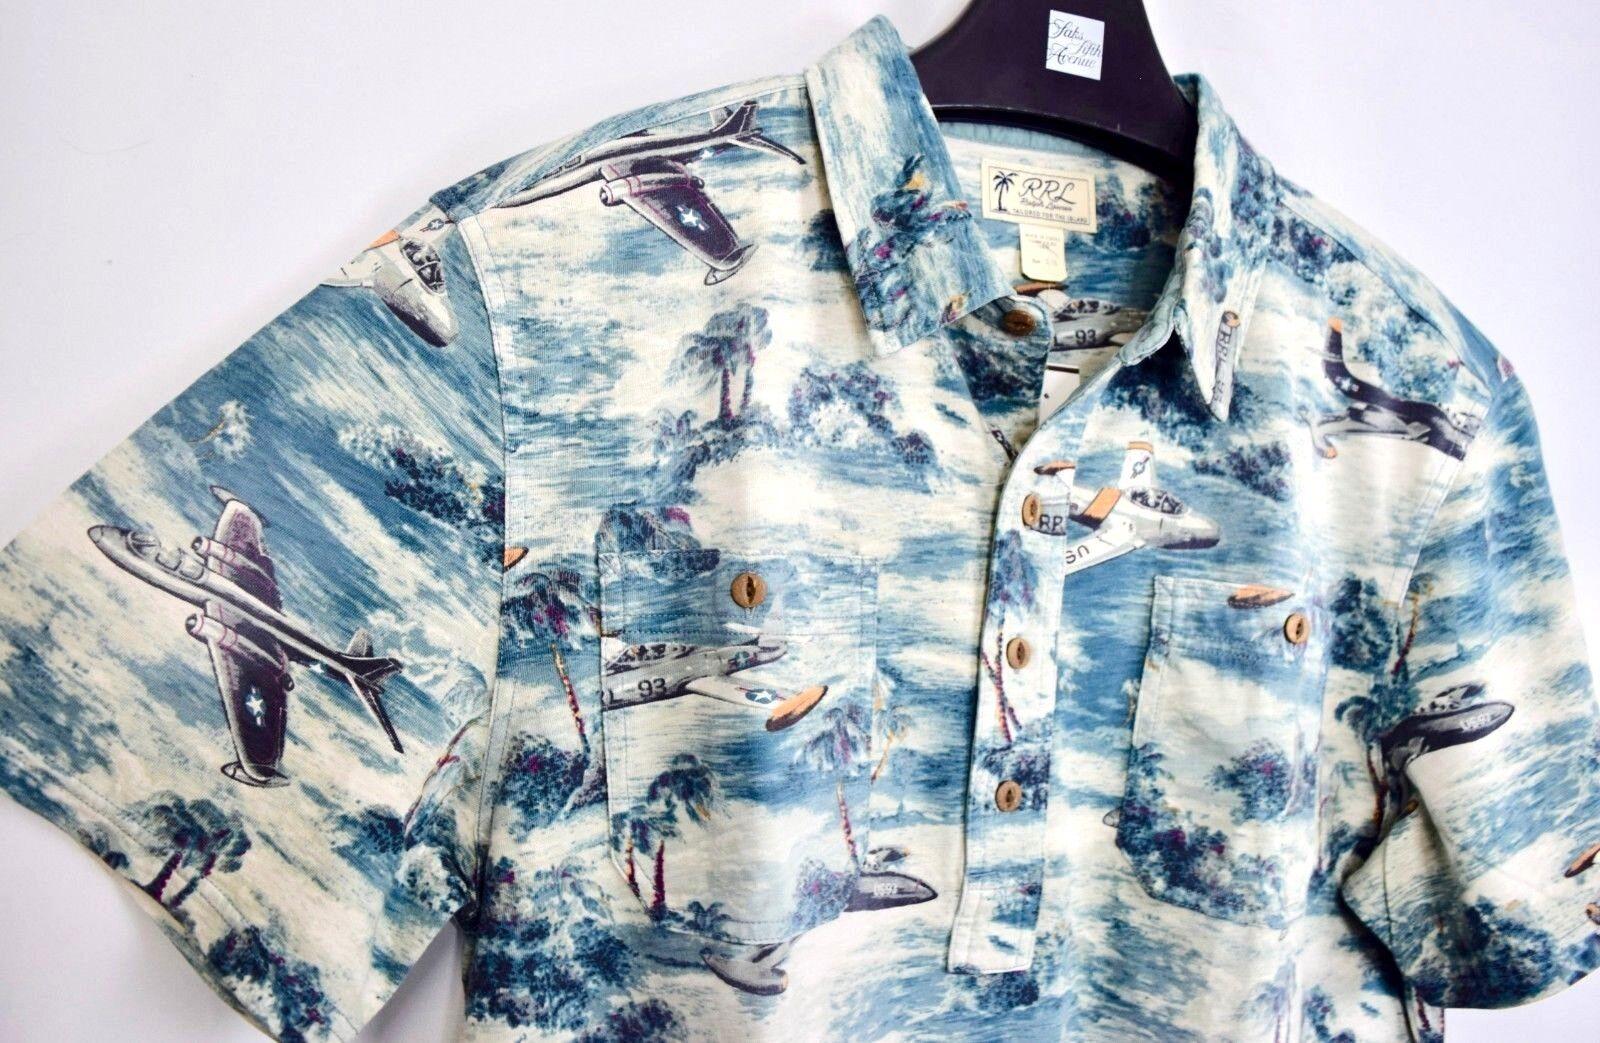 ee0471dcbc RRL Ralph Lauren 1940s Vintage Inspired Washed Jersey Work Shirt-MEN- XL. We 're ...